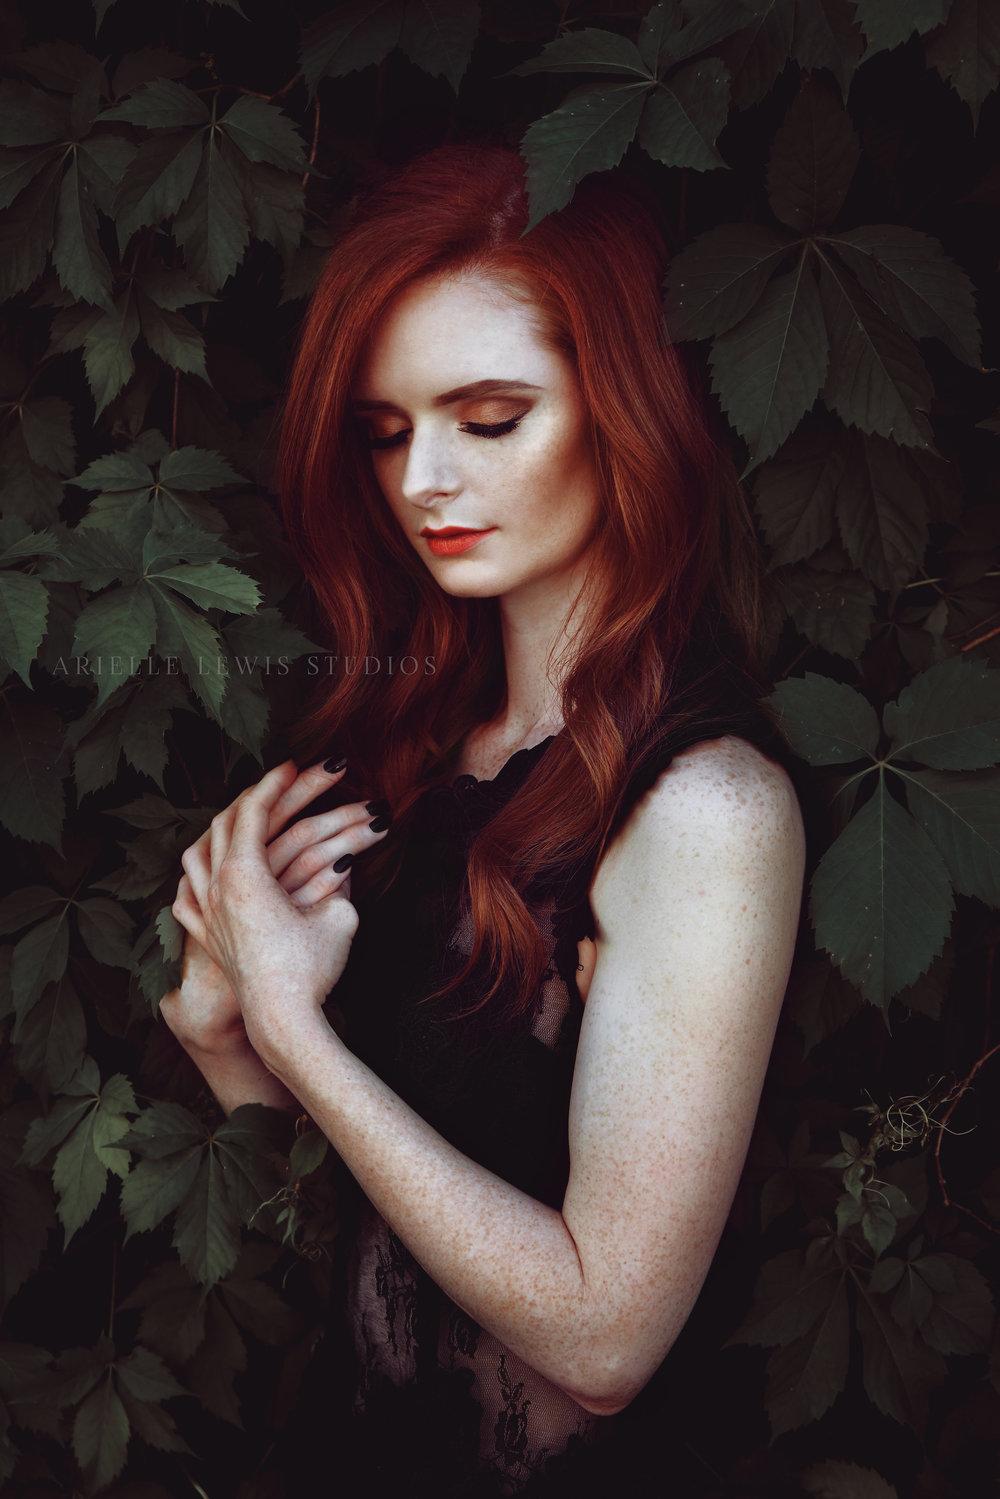 moody_redhead_portrait_ethereal.jpg